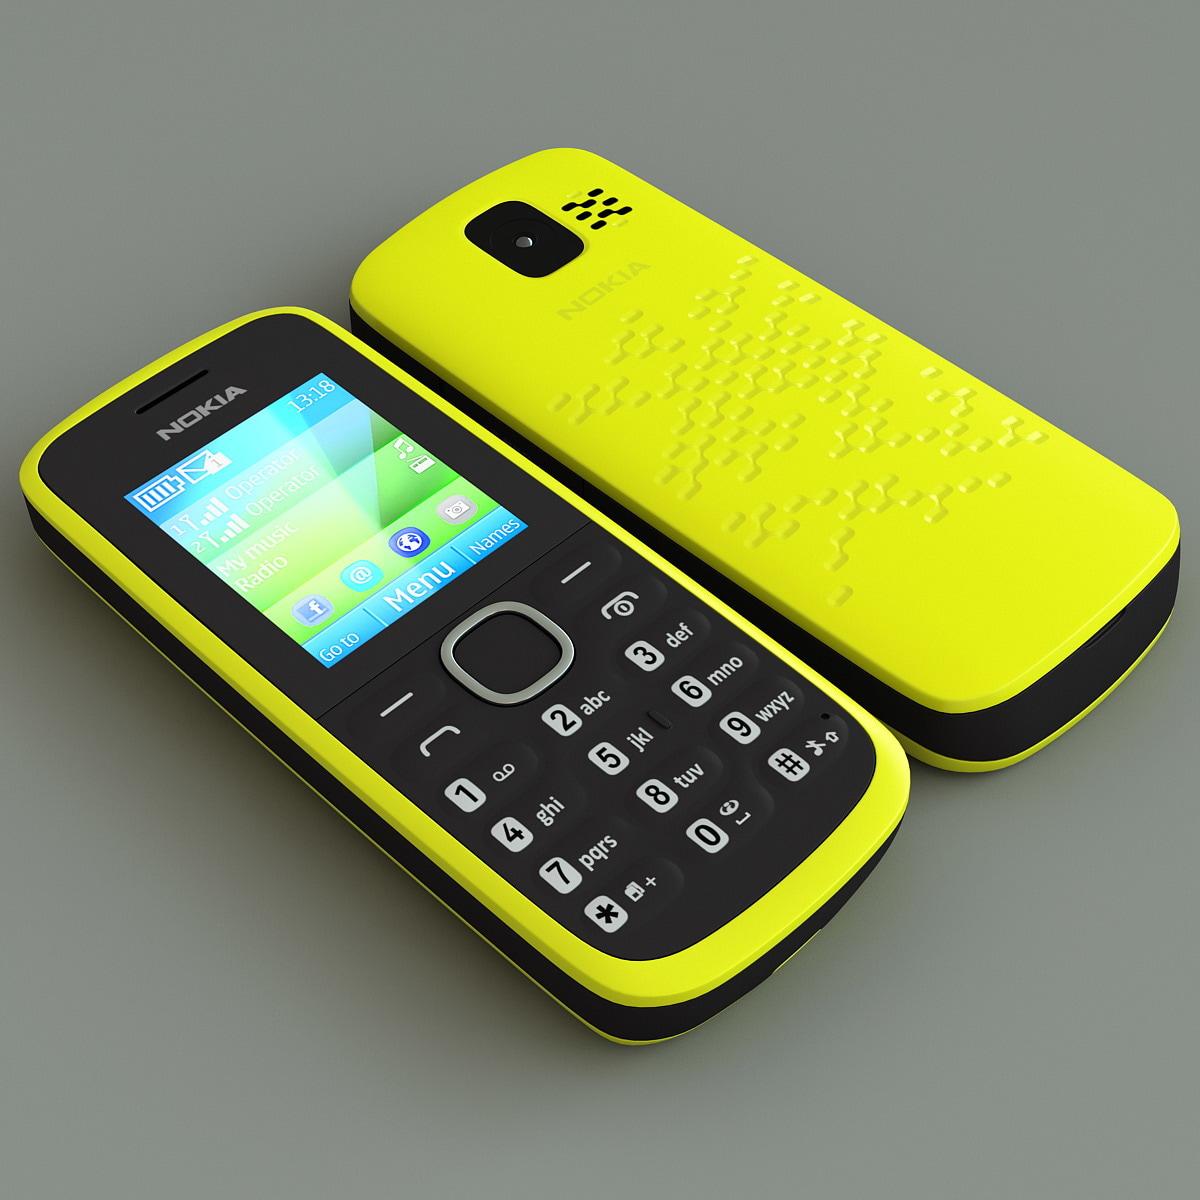 Nokia_110_Yellow_004.jpg